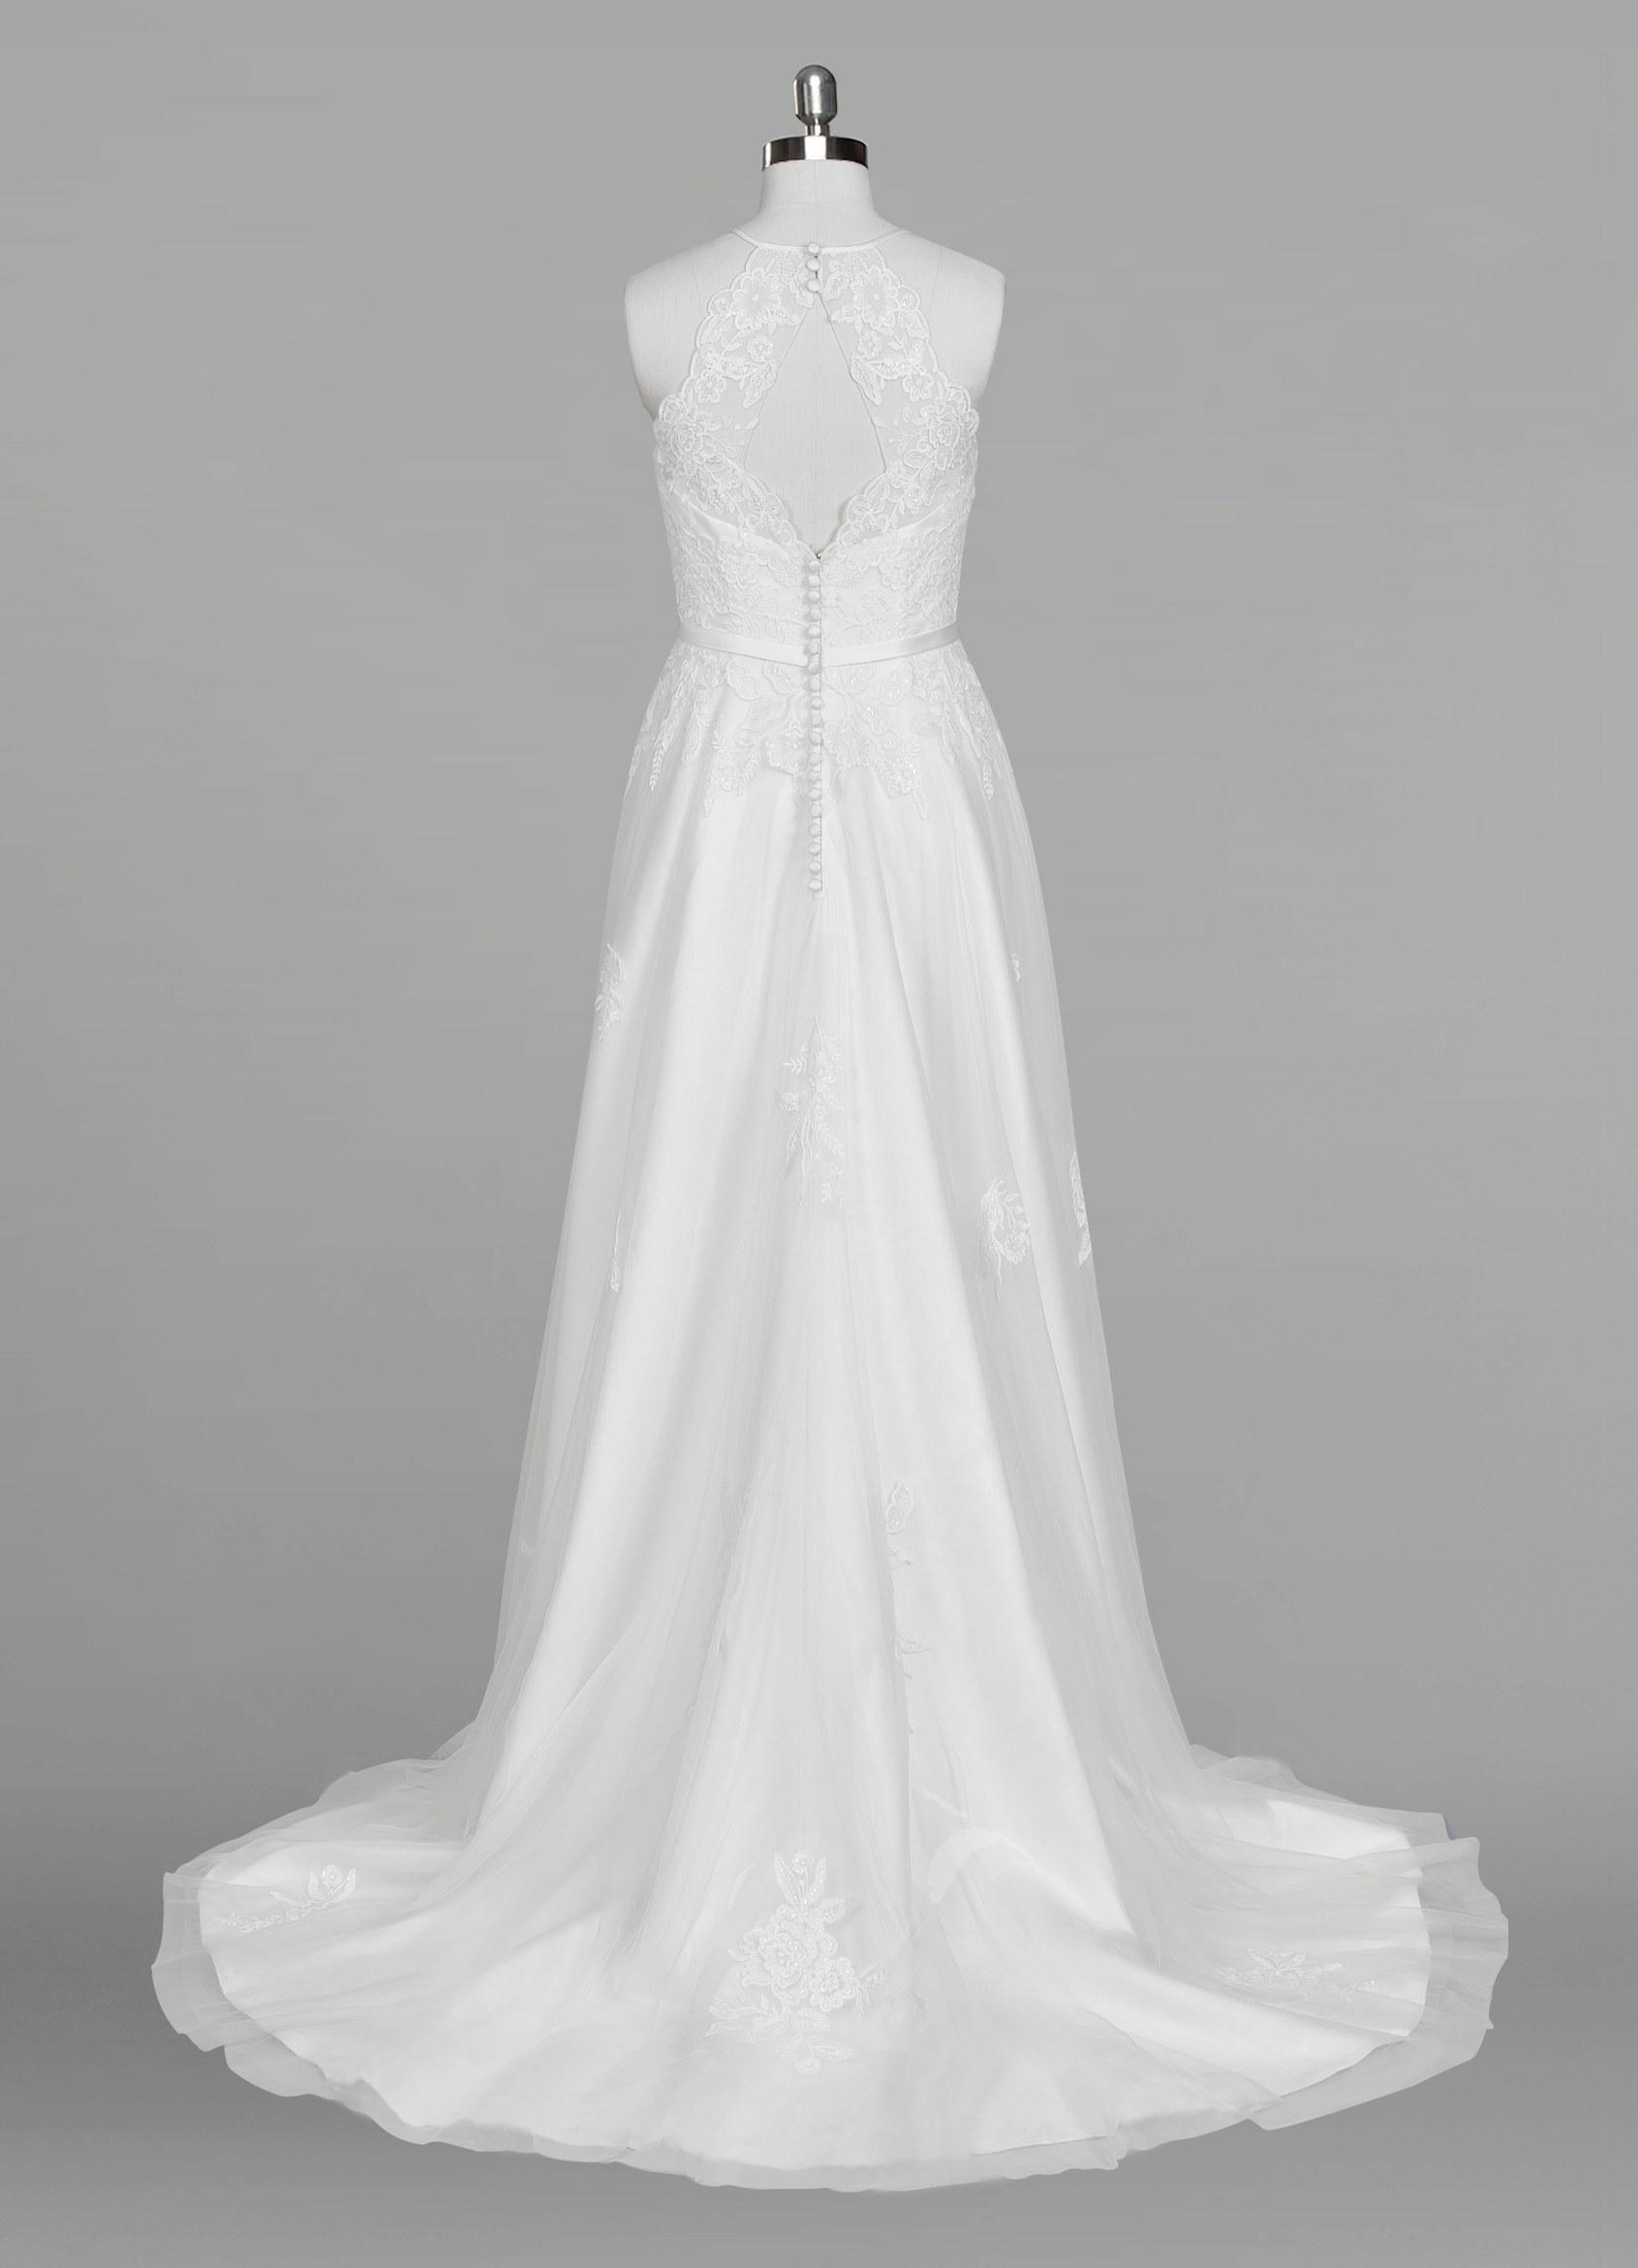 Rhiannon Bg Sample Dress